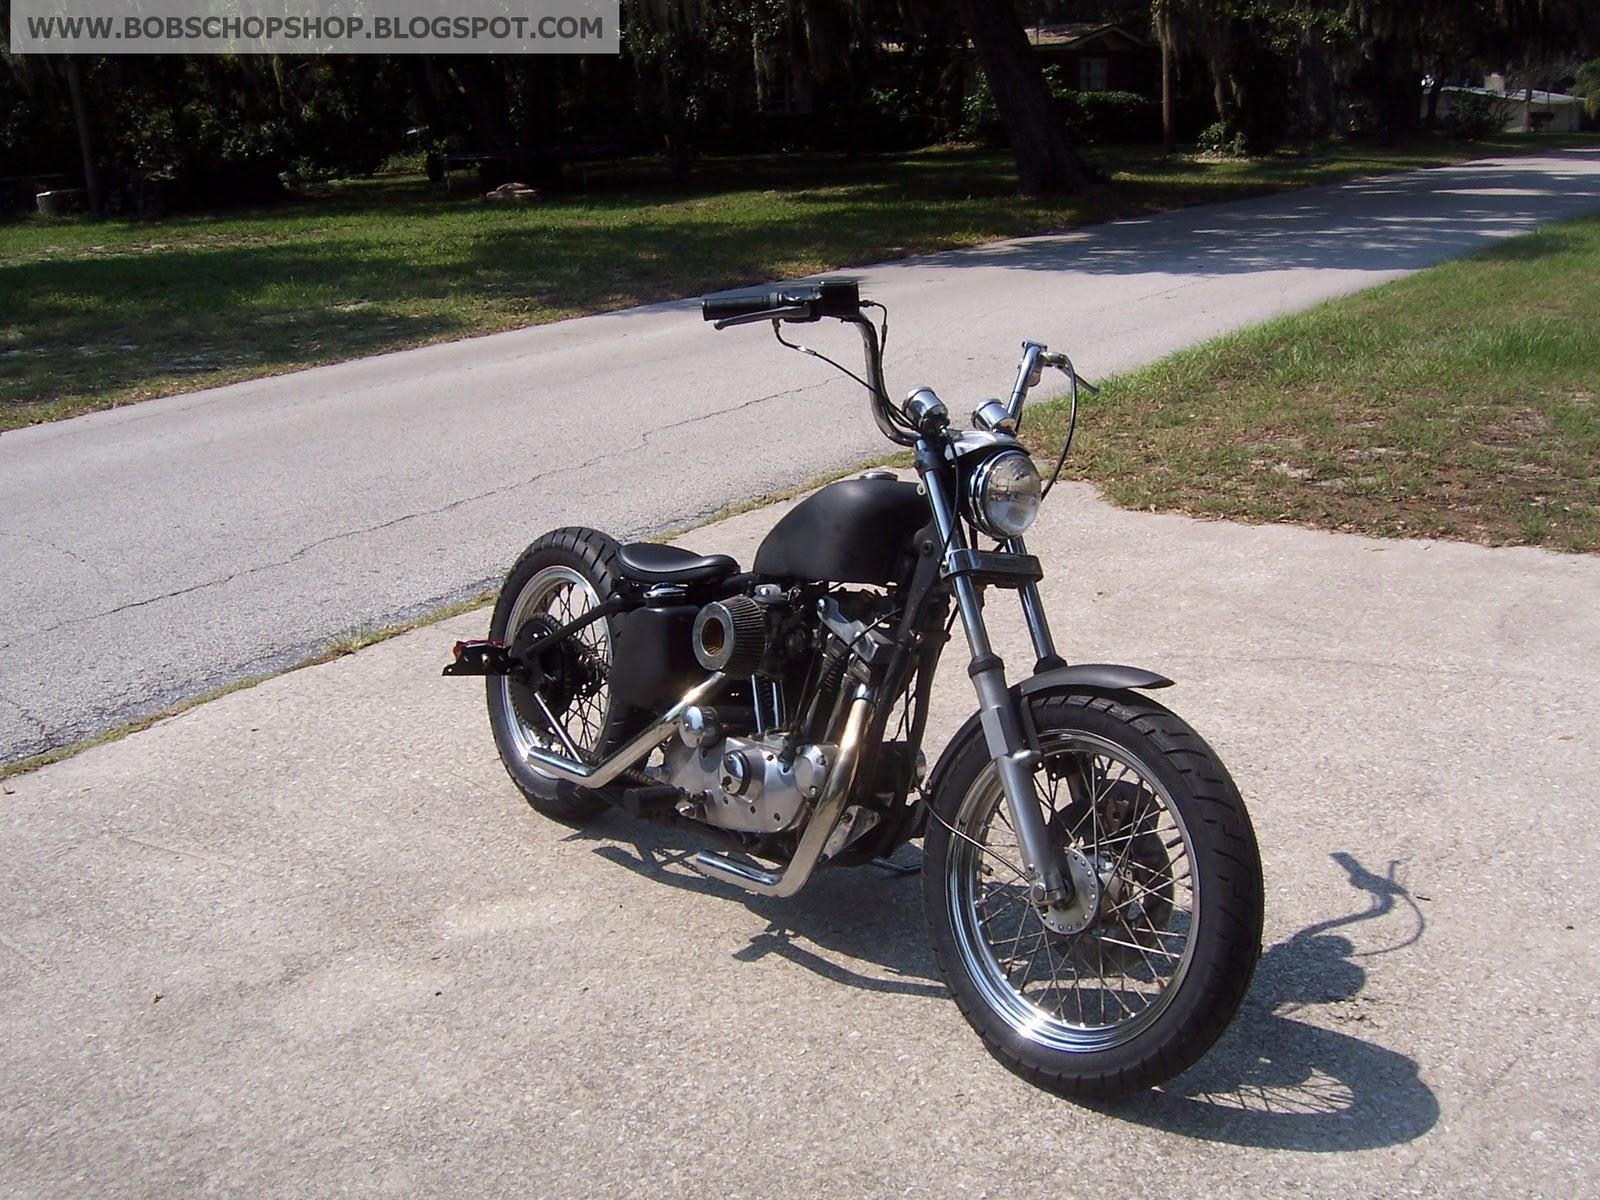 bobs chop shop 1977 harley ironhead sportster chopper bobber build